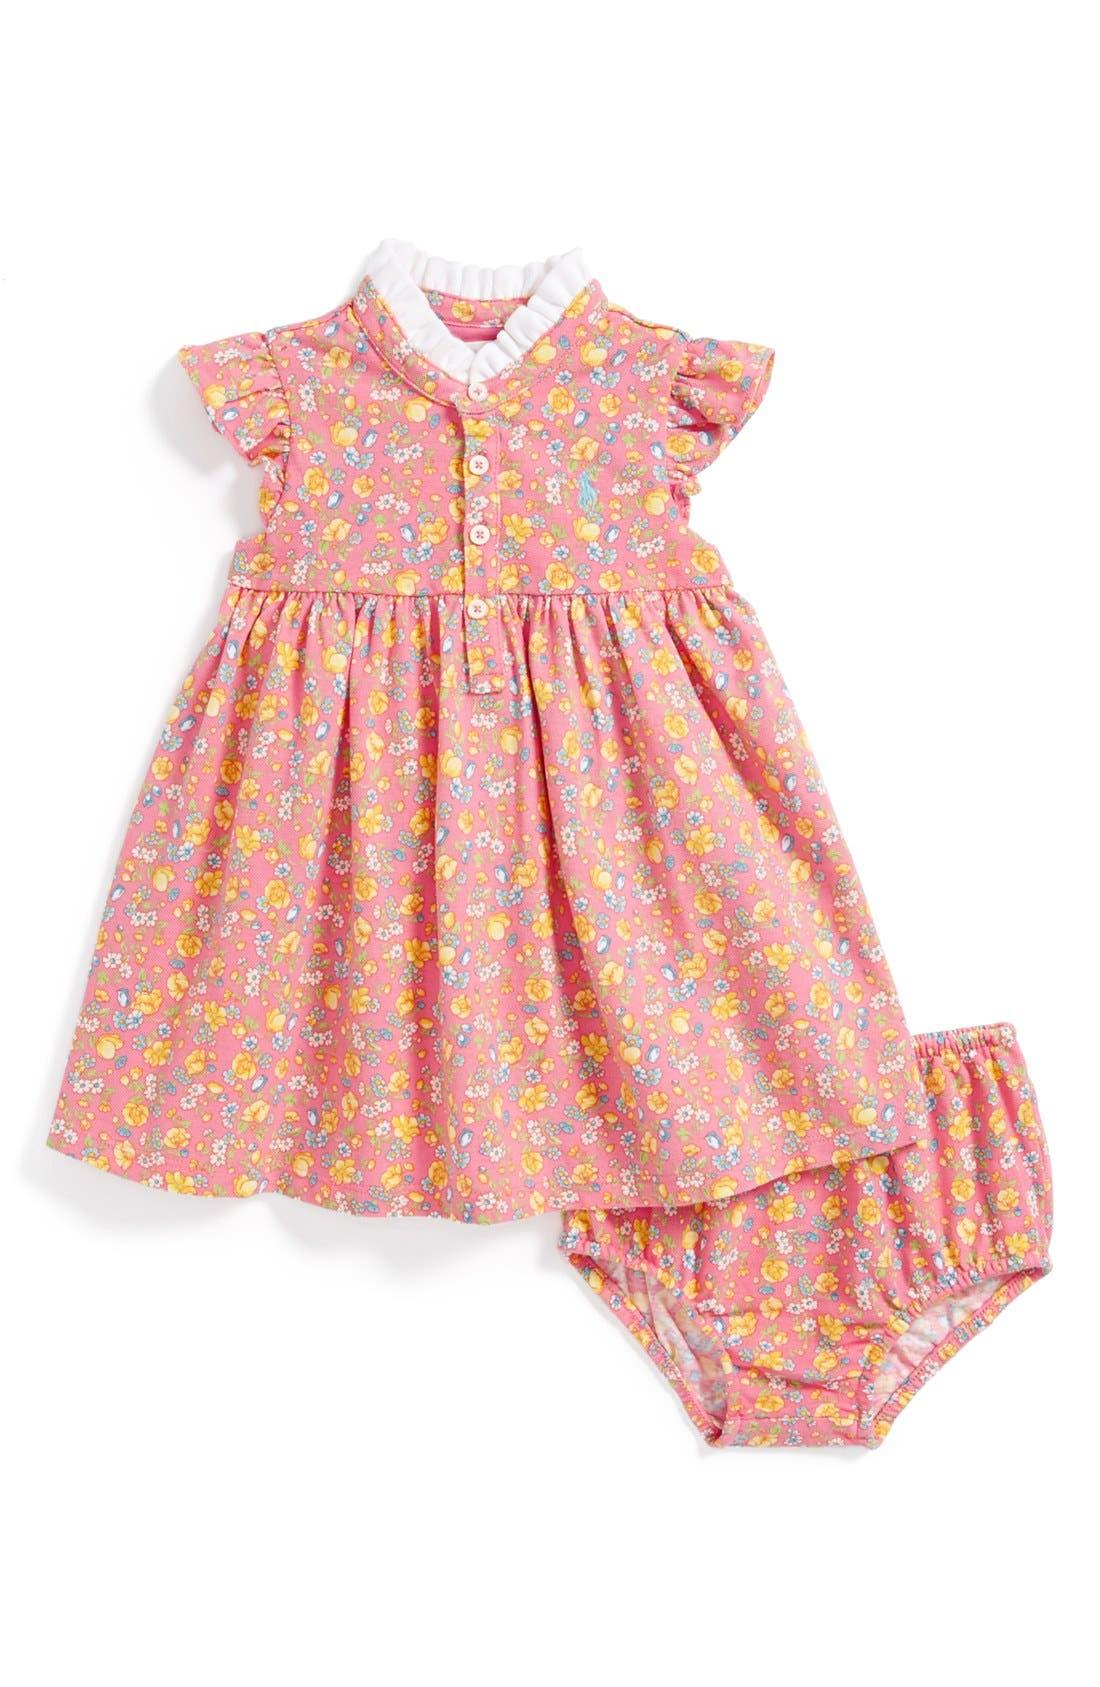 Alternate Image 1 Selected - Ralph Lauren Floral Print Dress & Bloomers (Baby Girls)